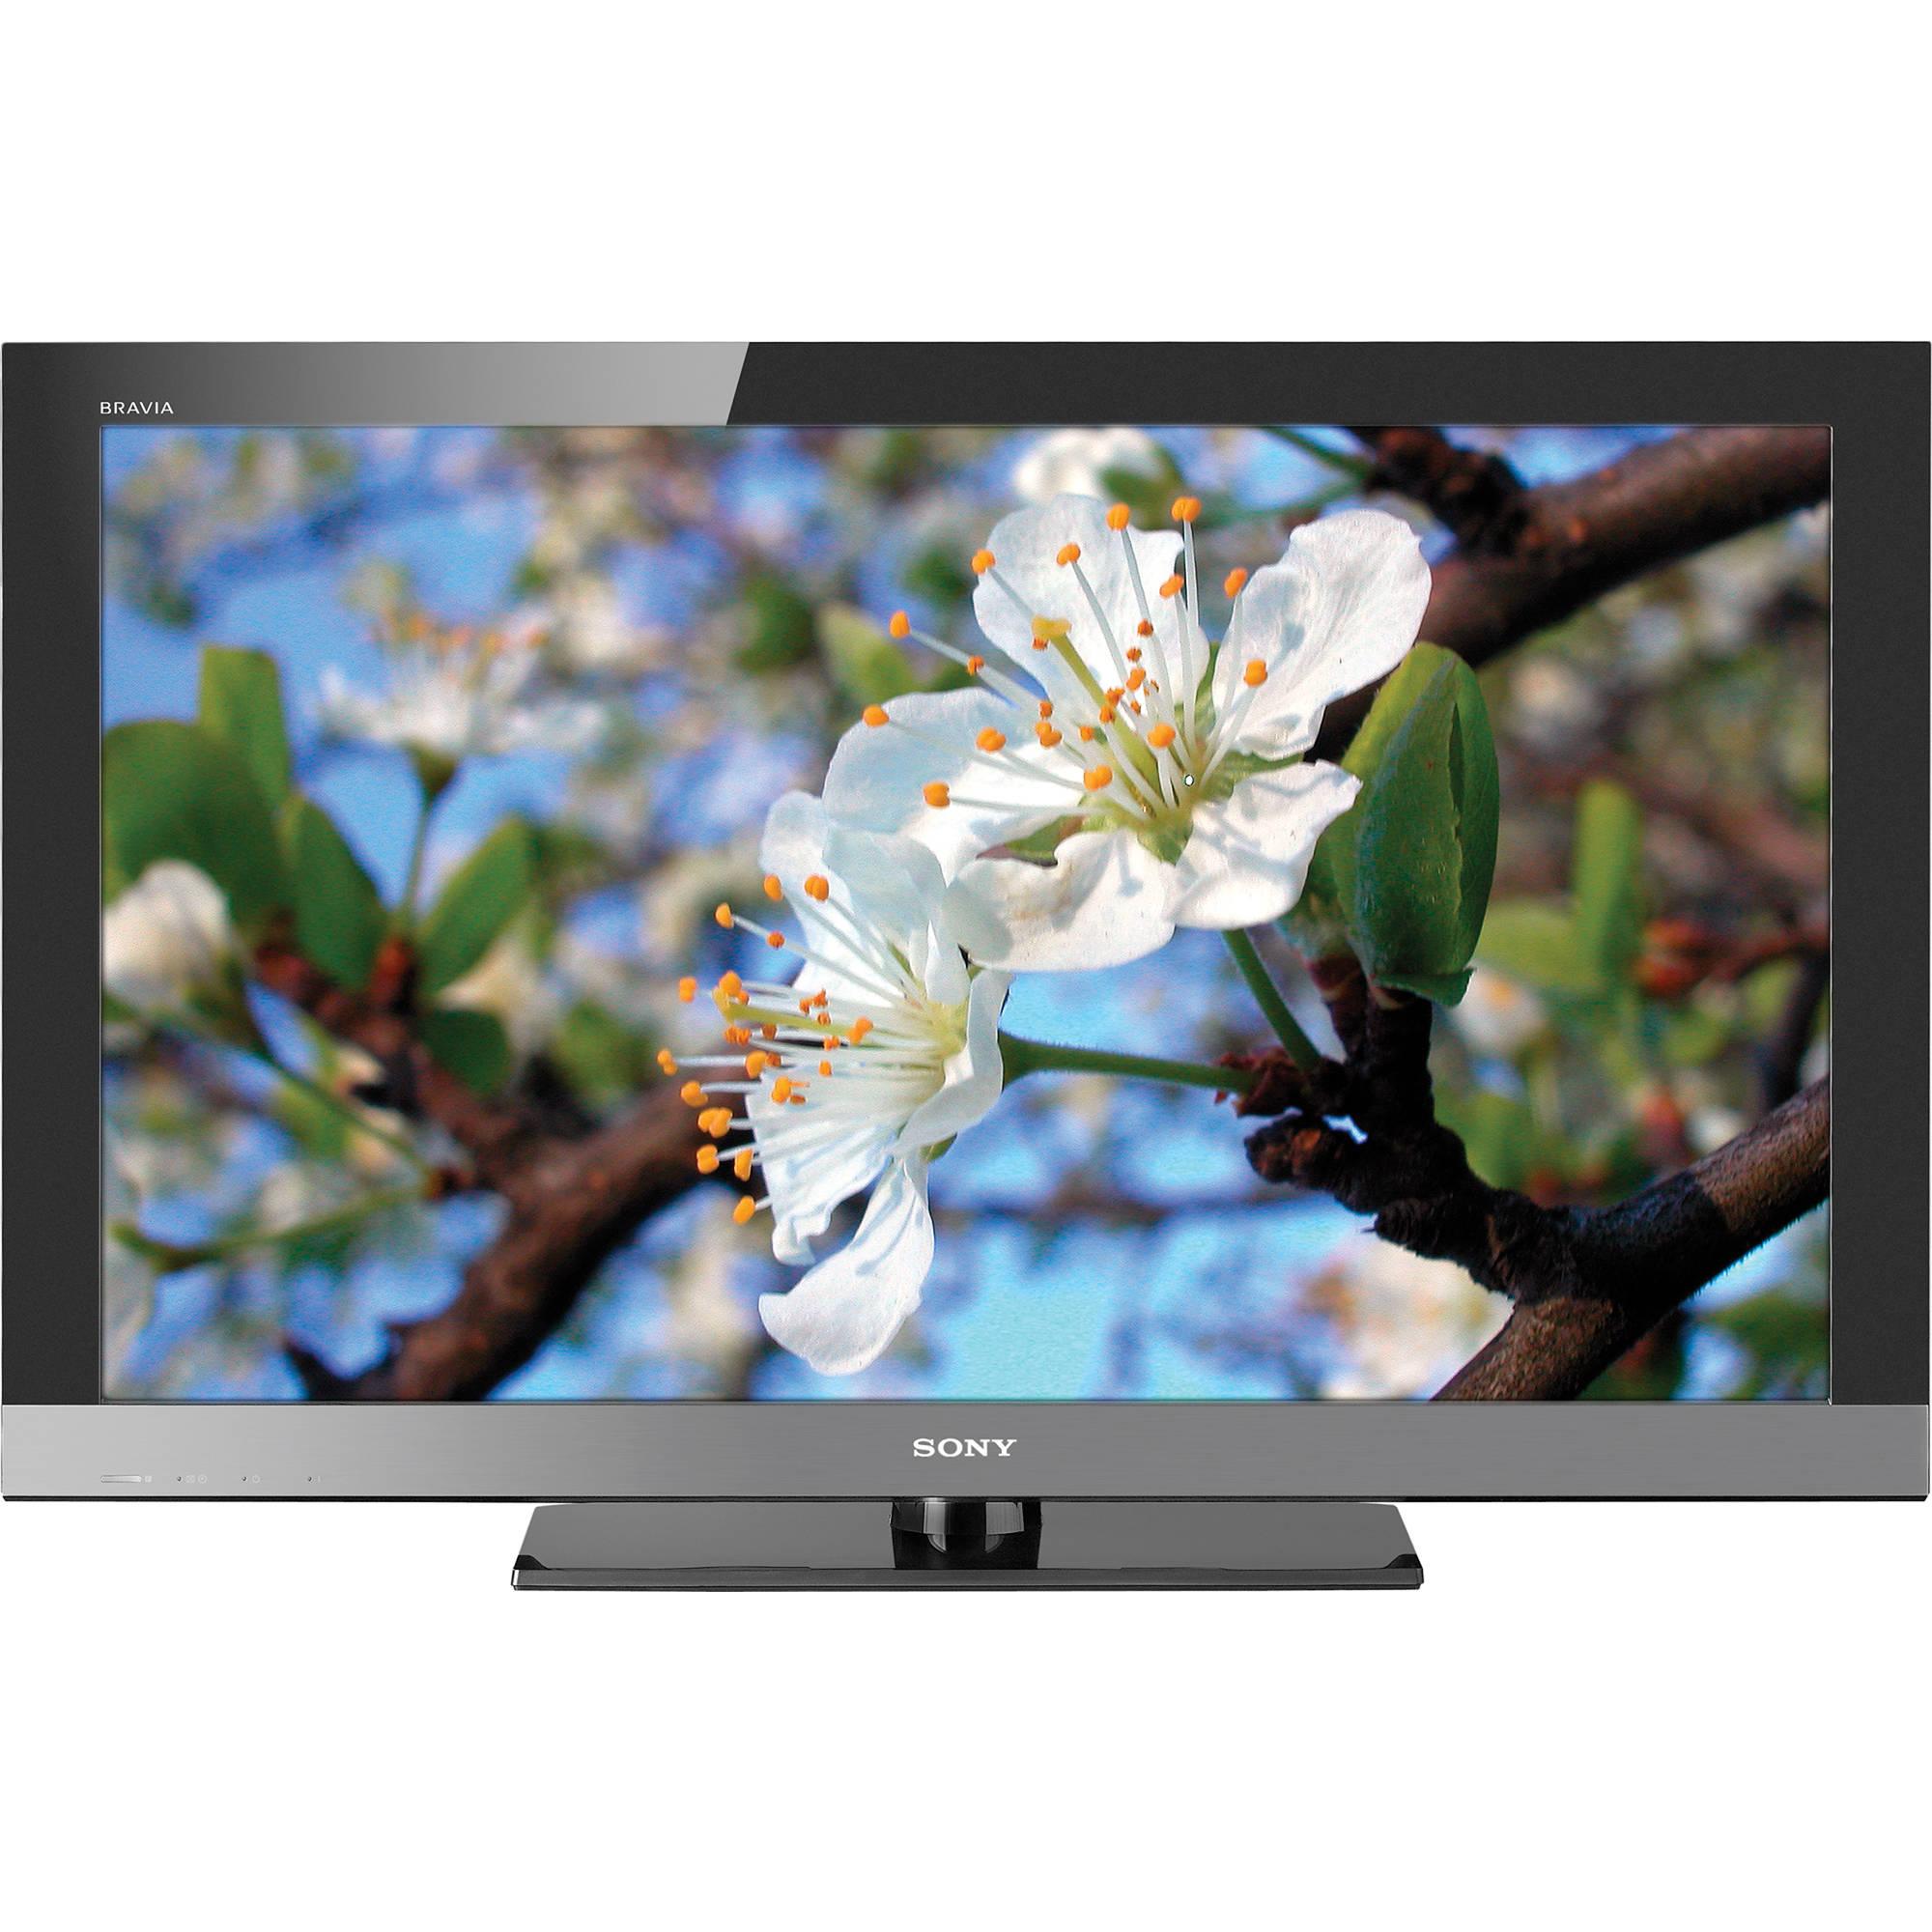 Sony BRAVIA KDL-40EX500 HDTV Driver for Windows 7